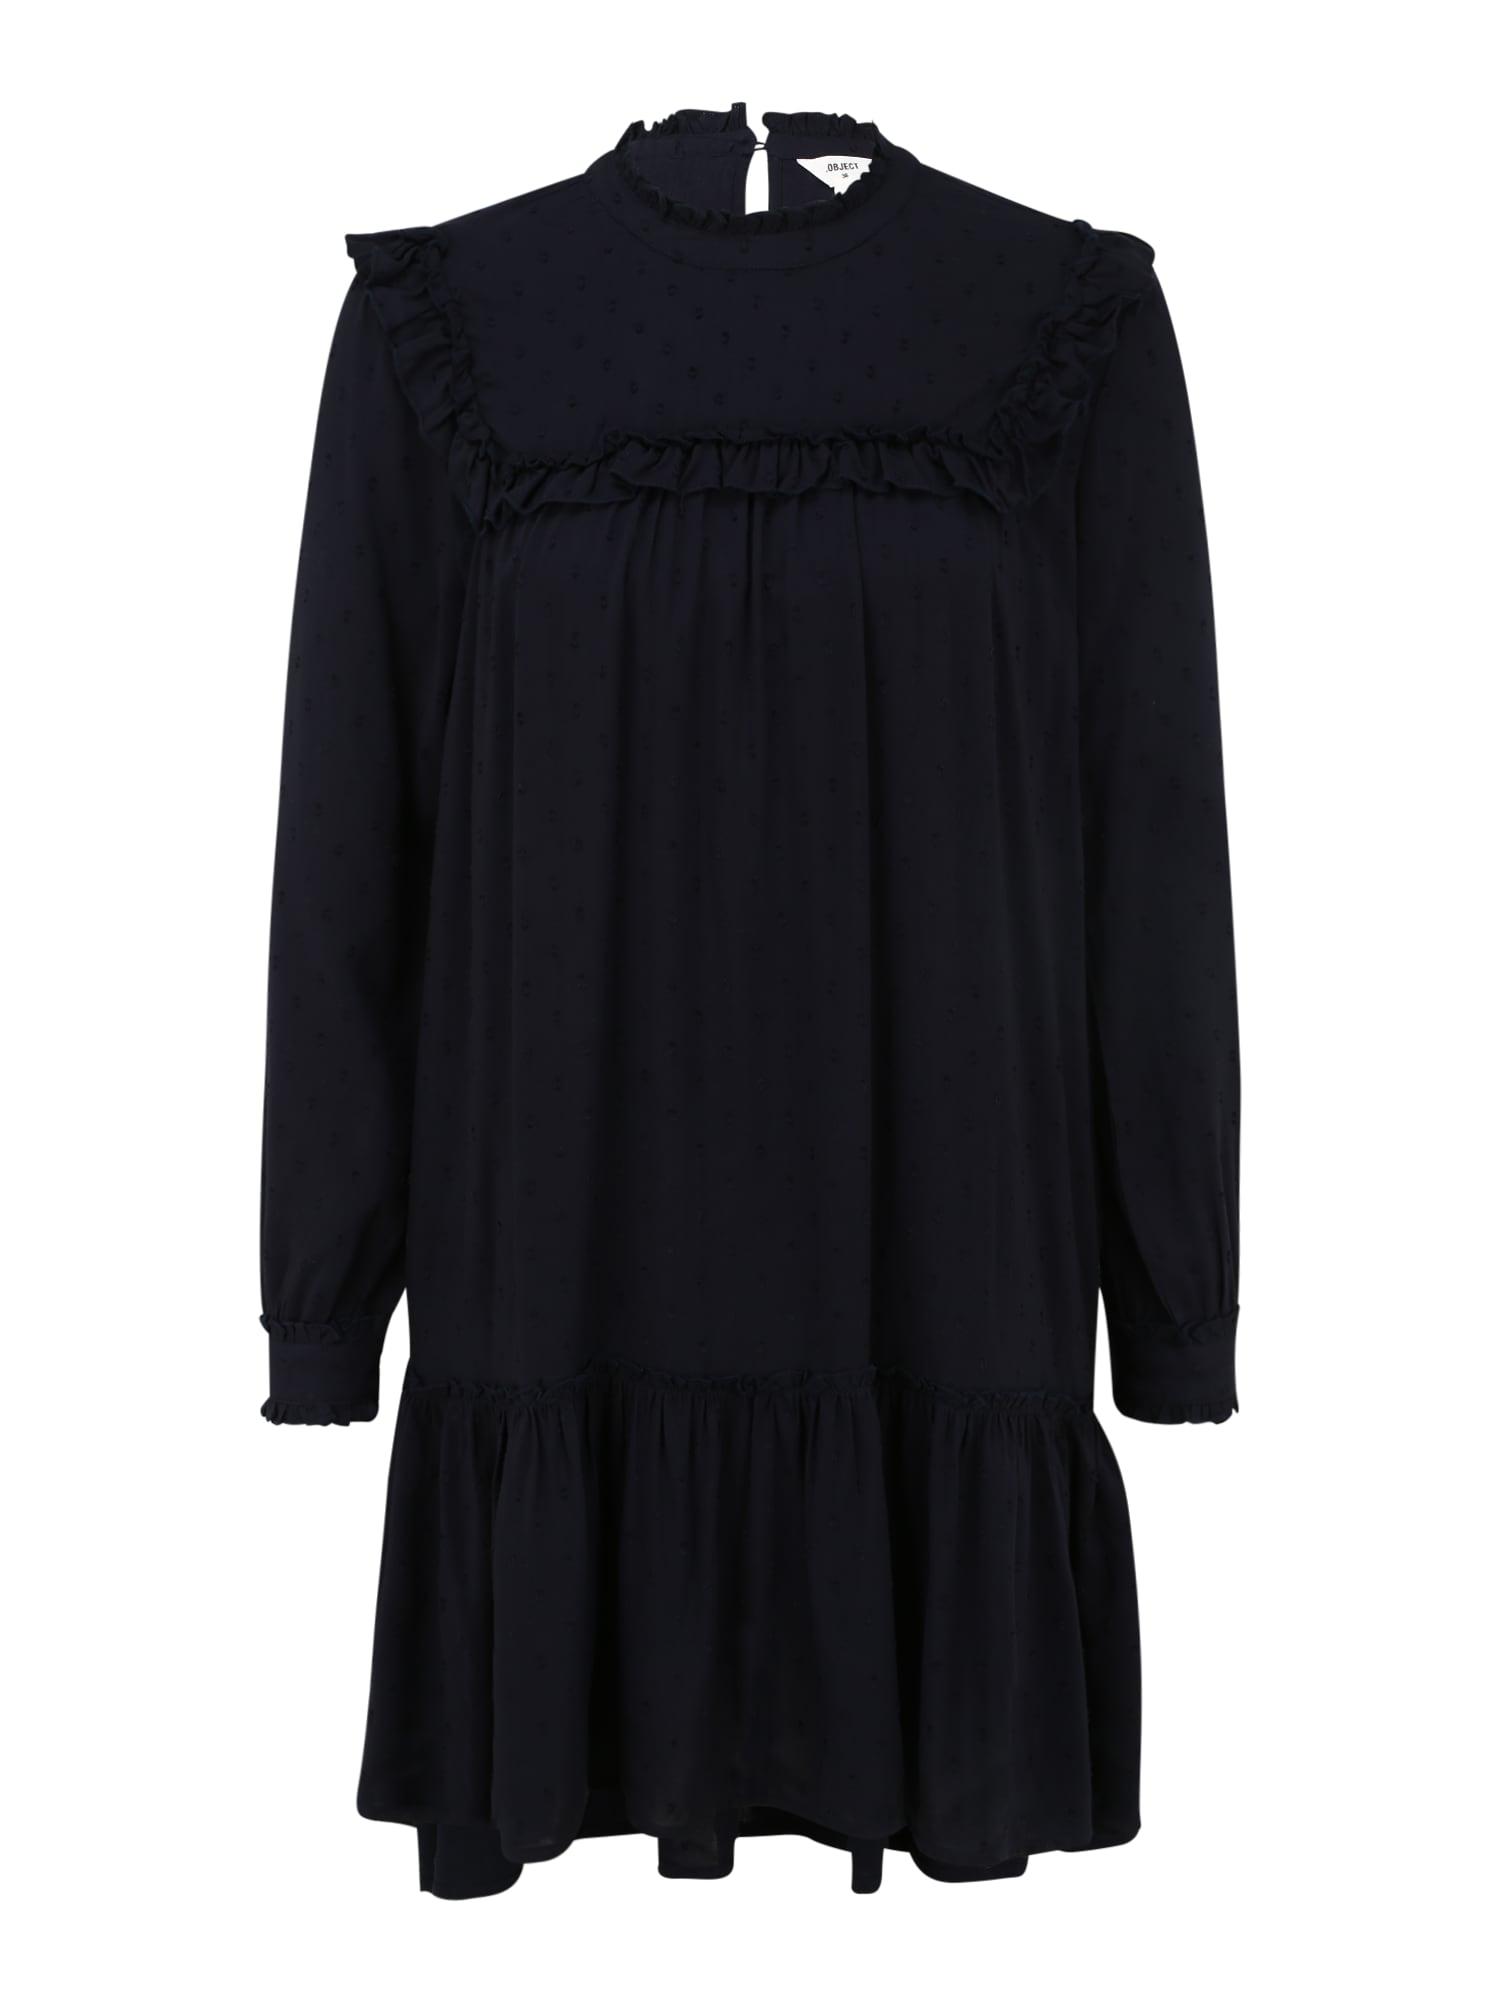 OBJECT (Petite) Suknelė tamsiai mėlyna